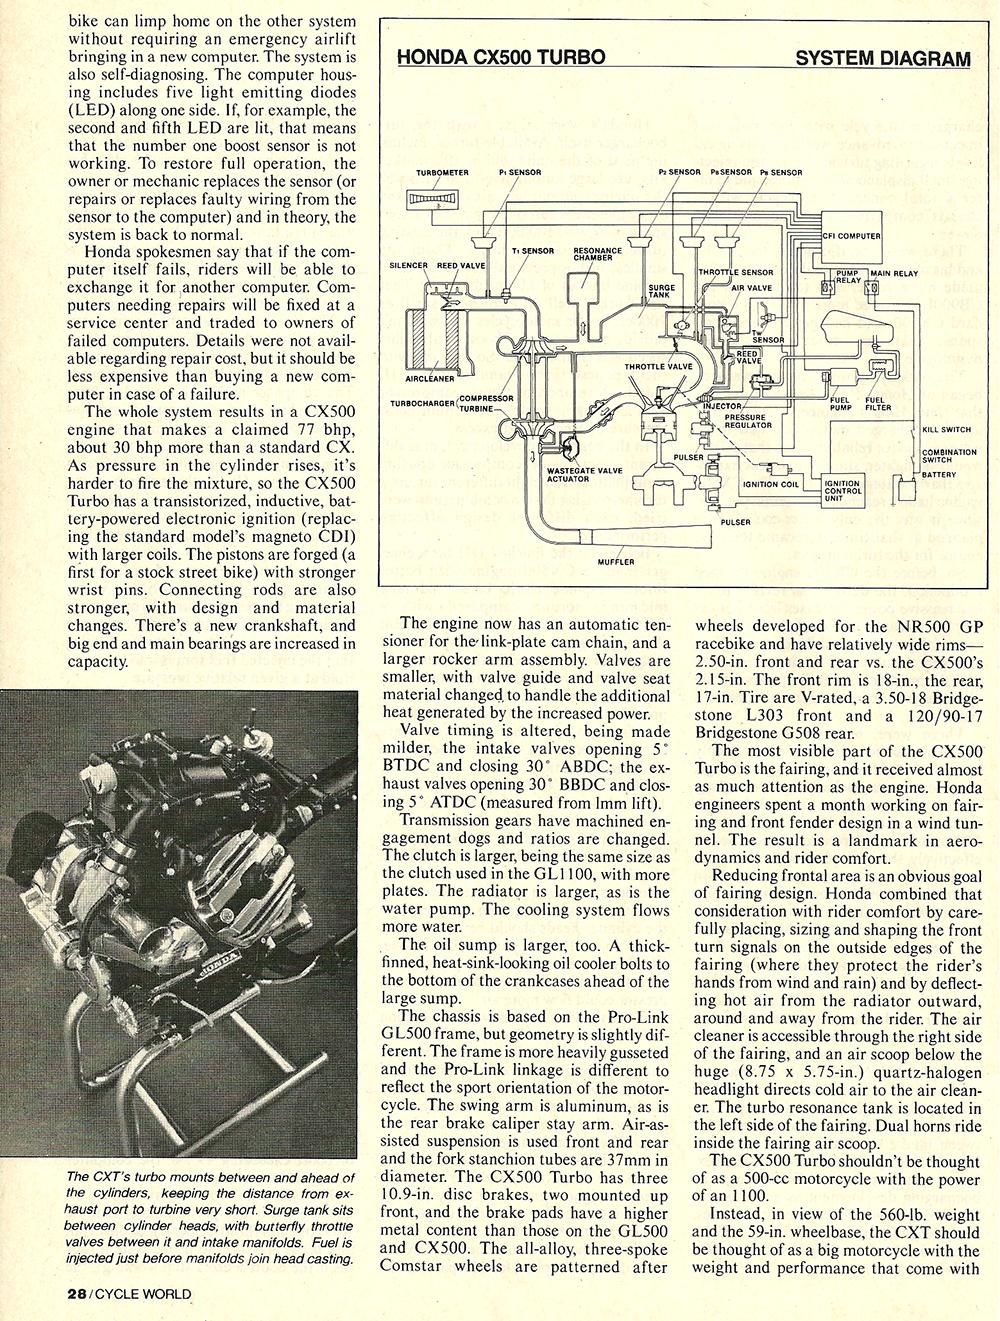 1981 Honda CX500 Turbo road test — Ye Olde Cycle Shoppe